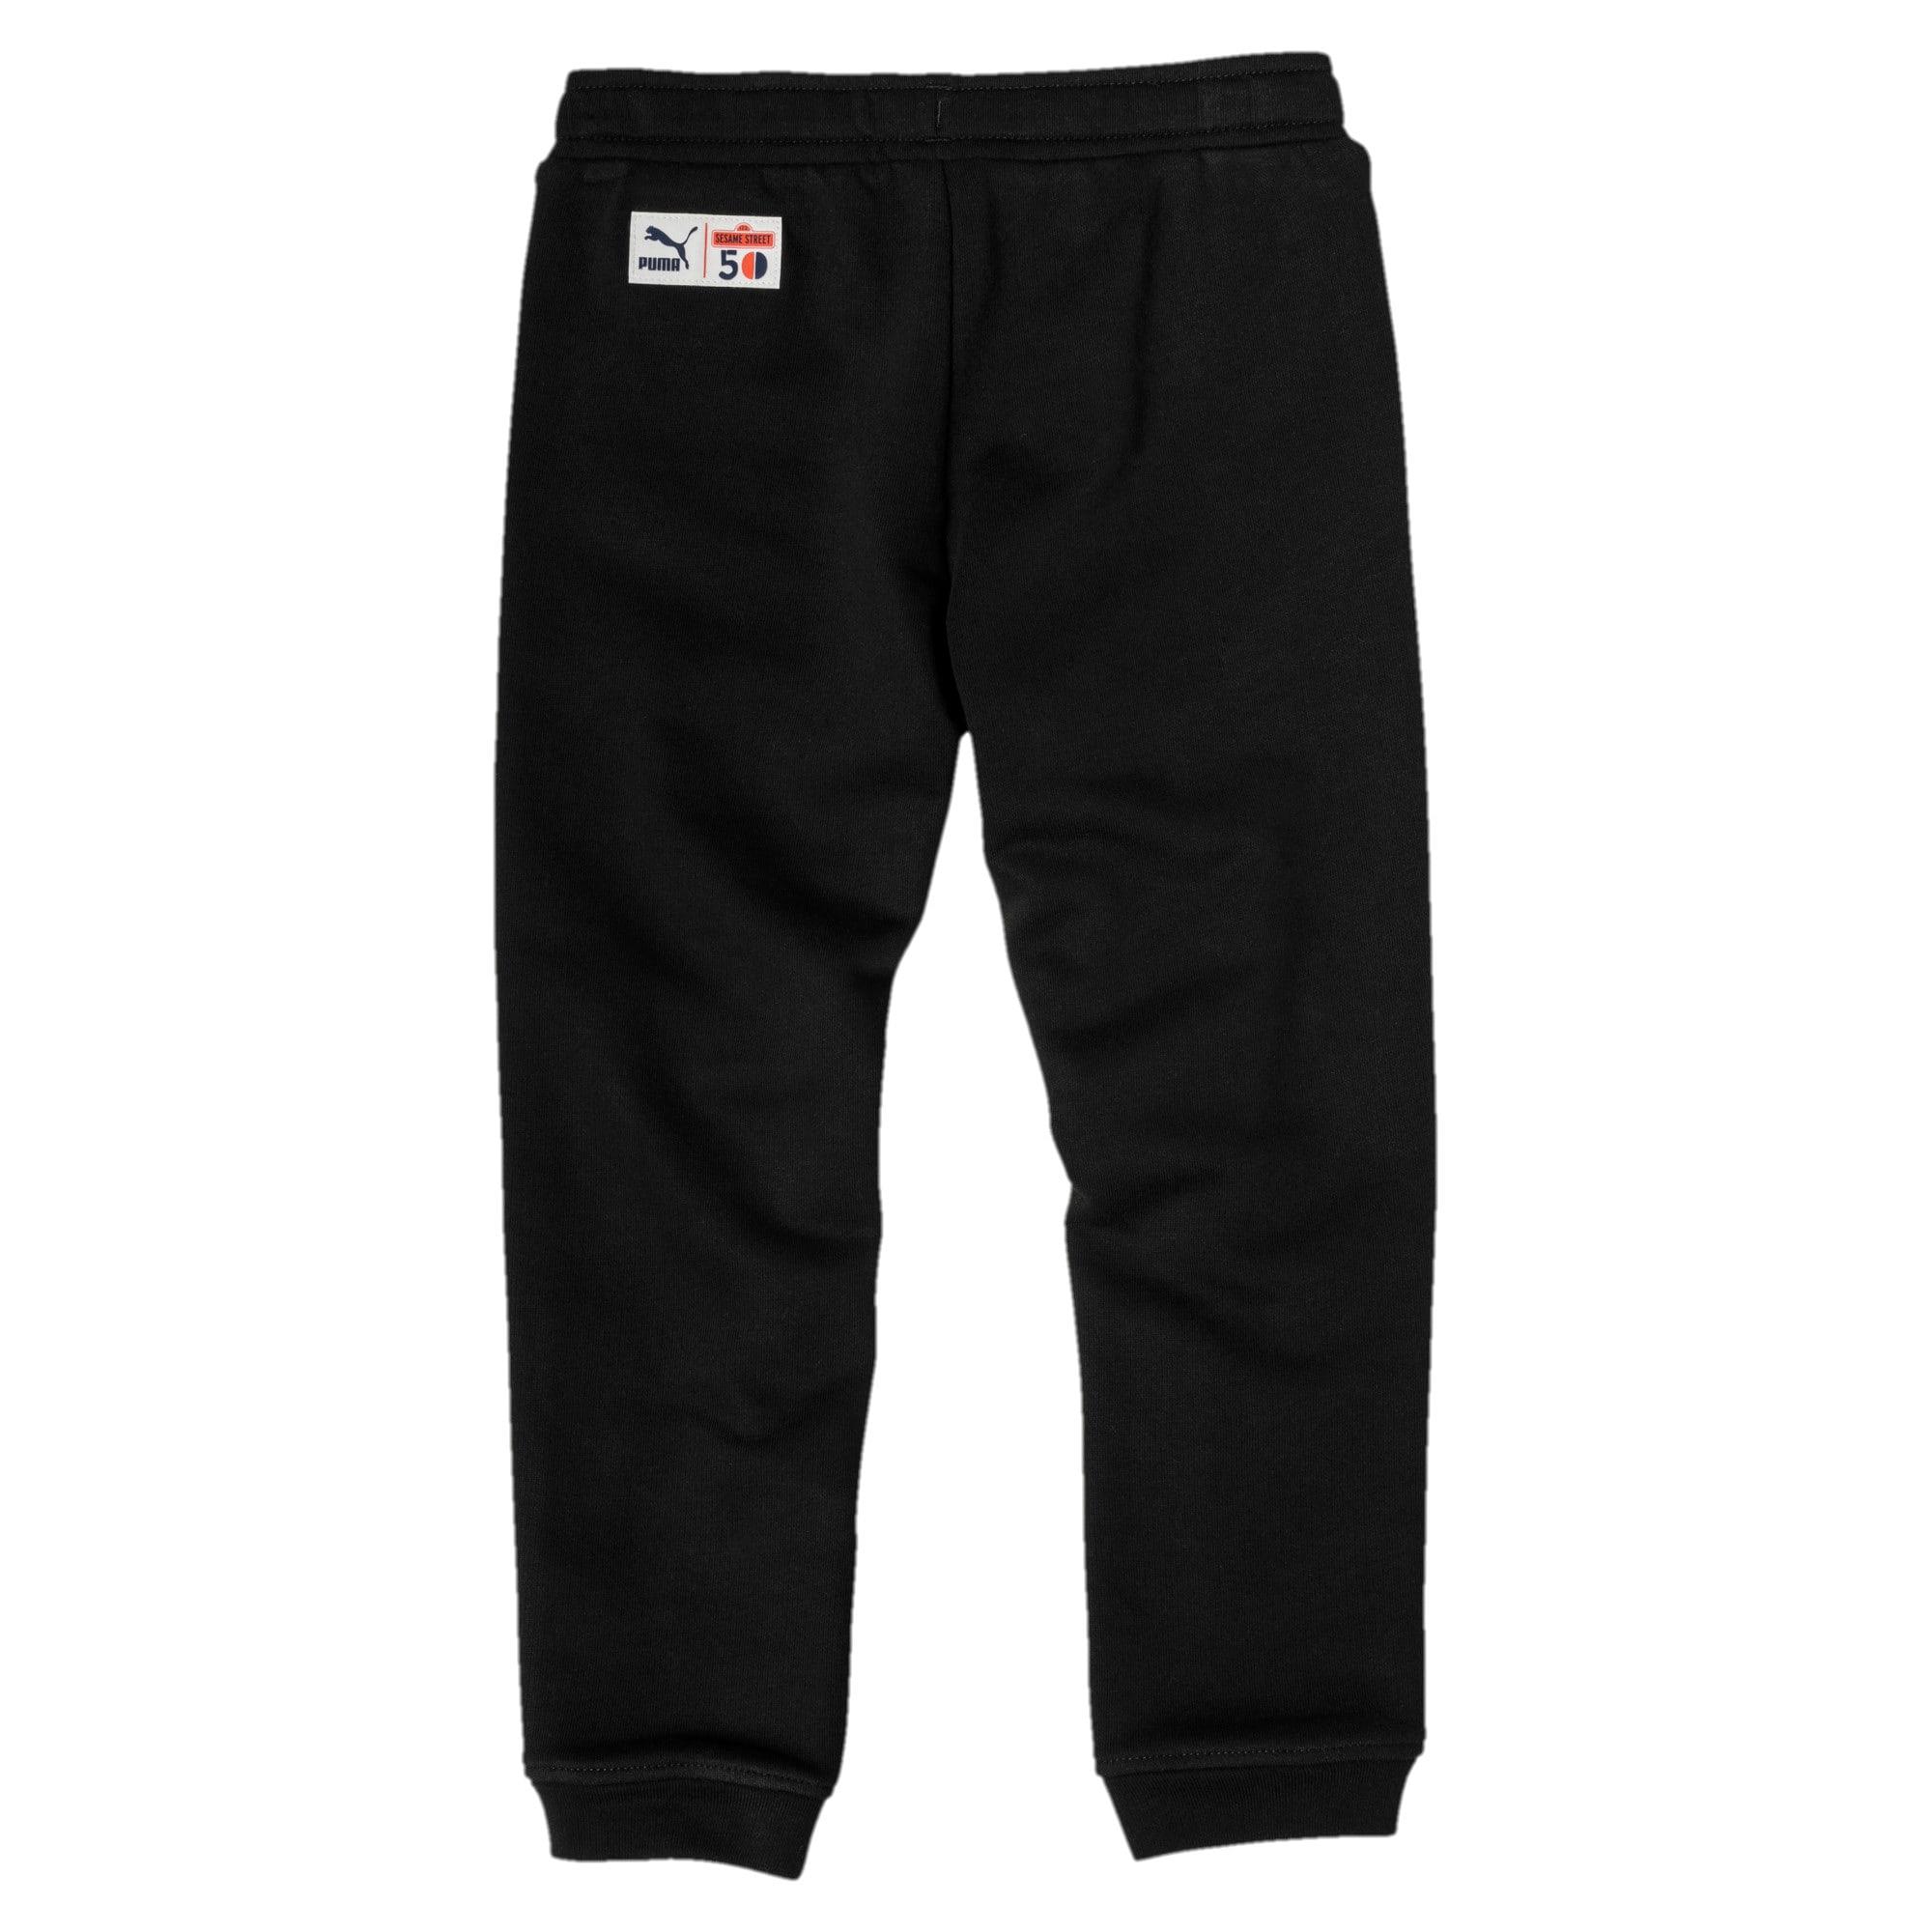 Thumbnail 2 of Sesame Street Knitted Boys' Pants, Cotton Black, medium